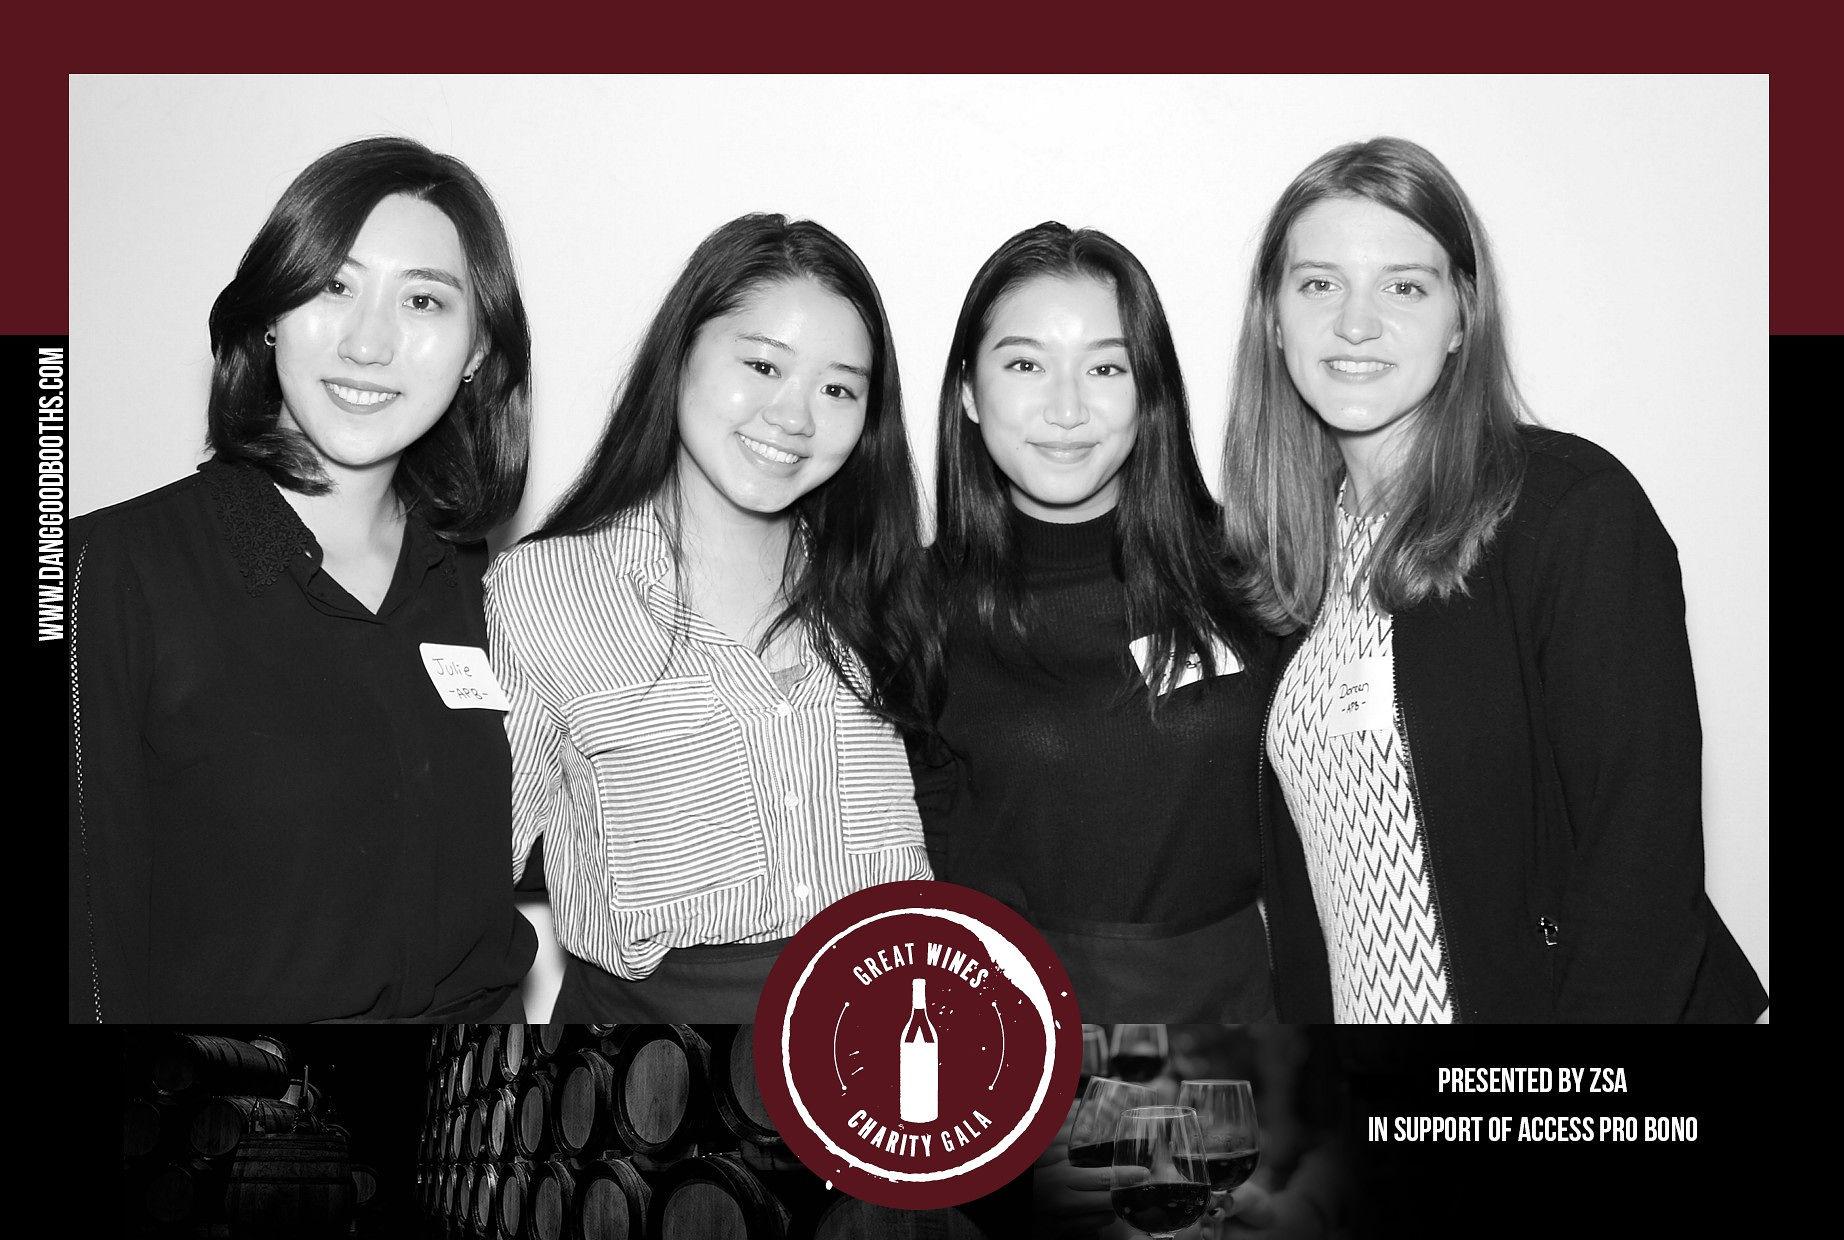 Vancouver_PhotoBooths-C-2018-10-03_1_18.jpg